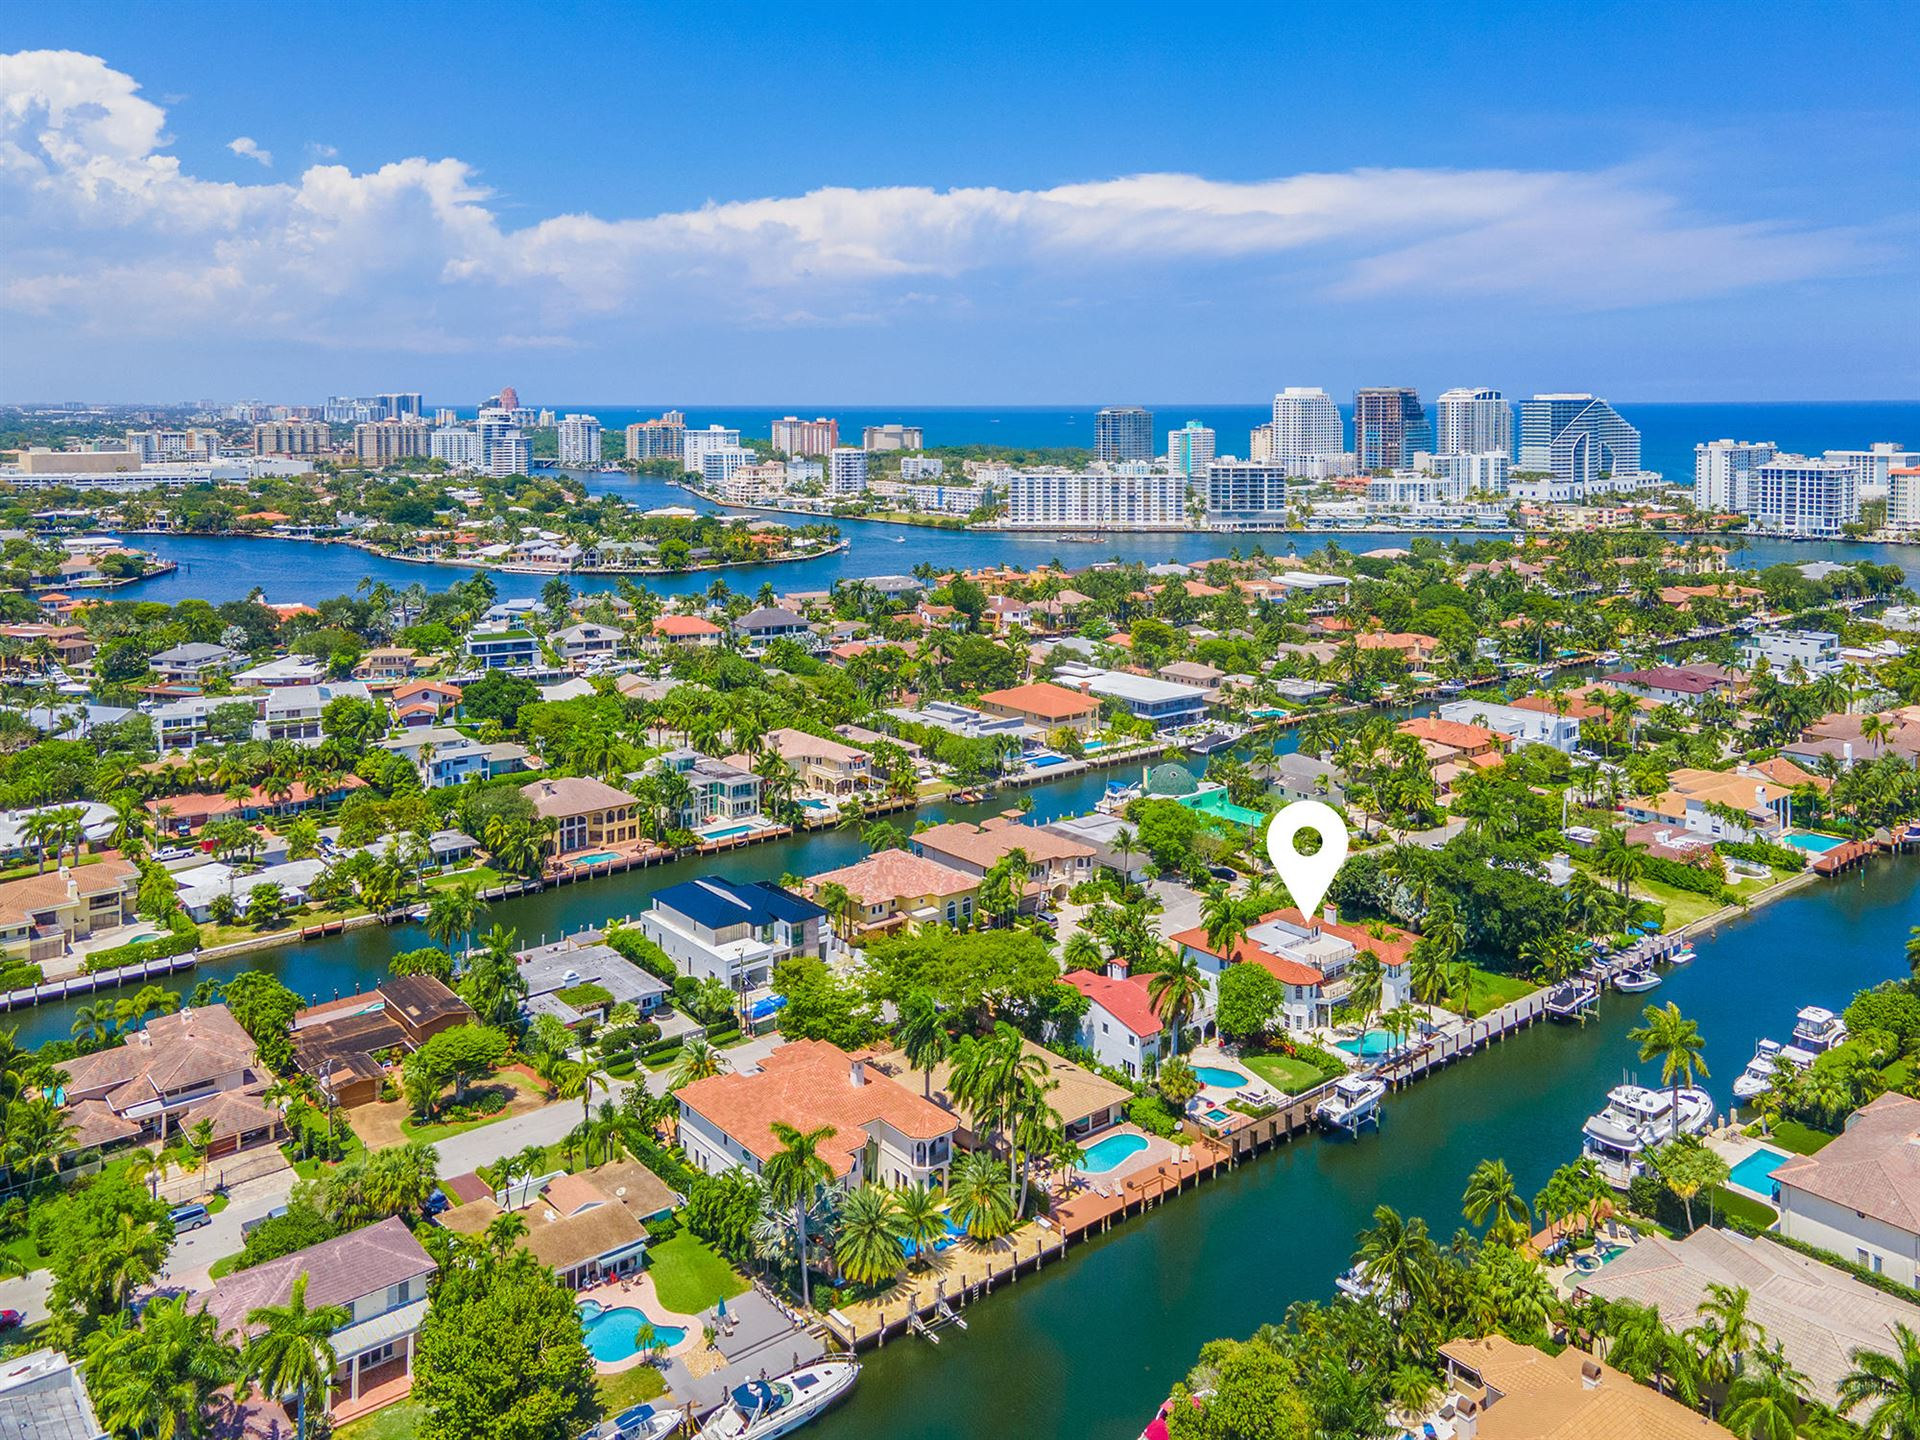 Photo of 2420 Sea Island Drive, Fort Lauderdale, FL 33301 (MLS # RX-10732381)